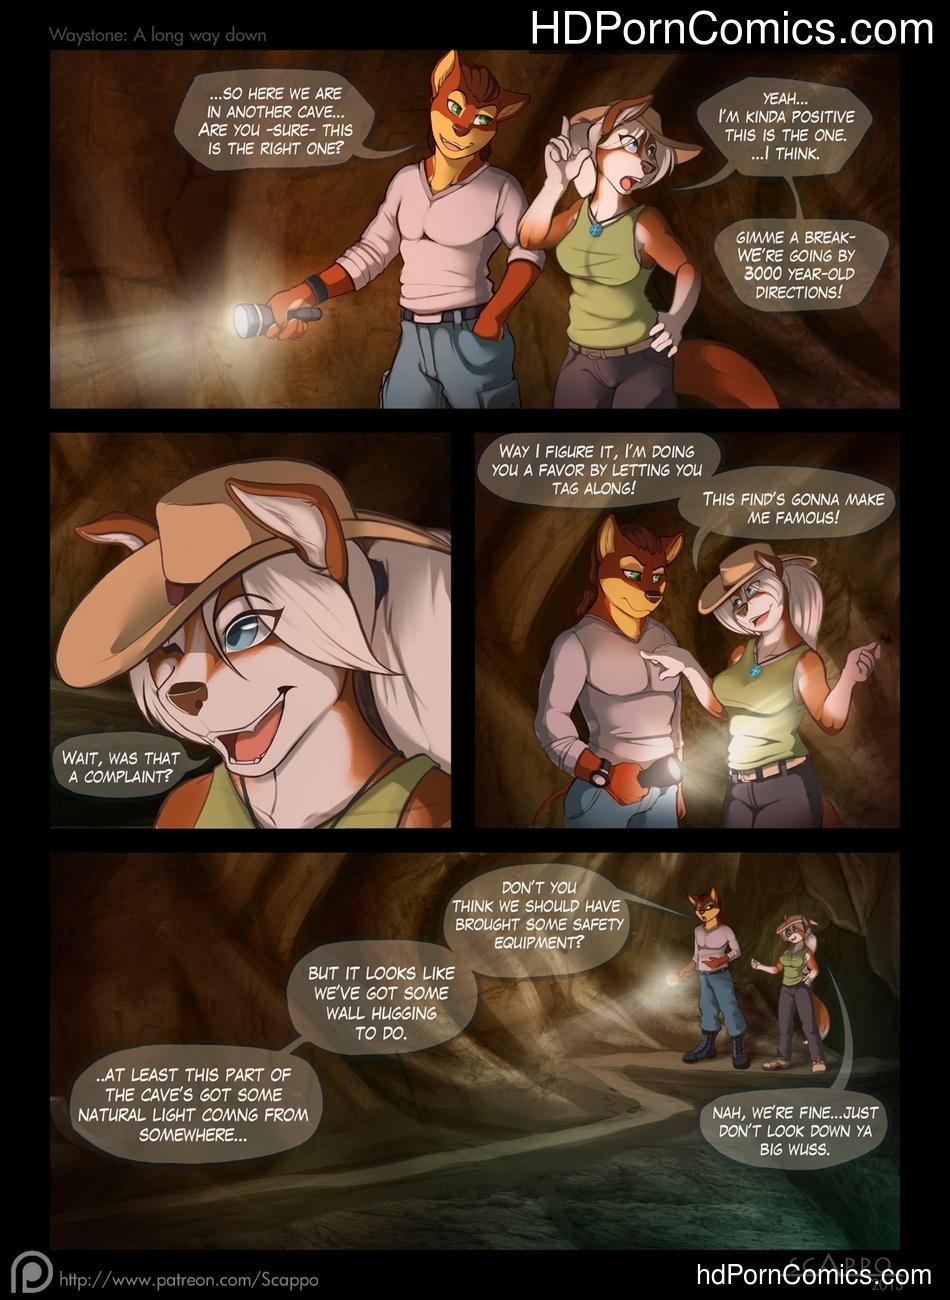 Waystone - A Long Way Down 1 free sex comic